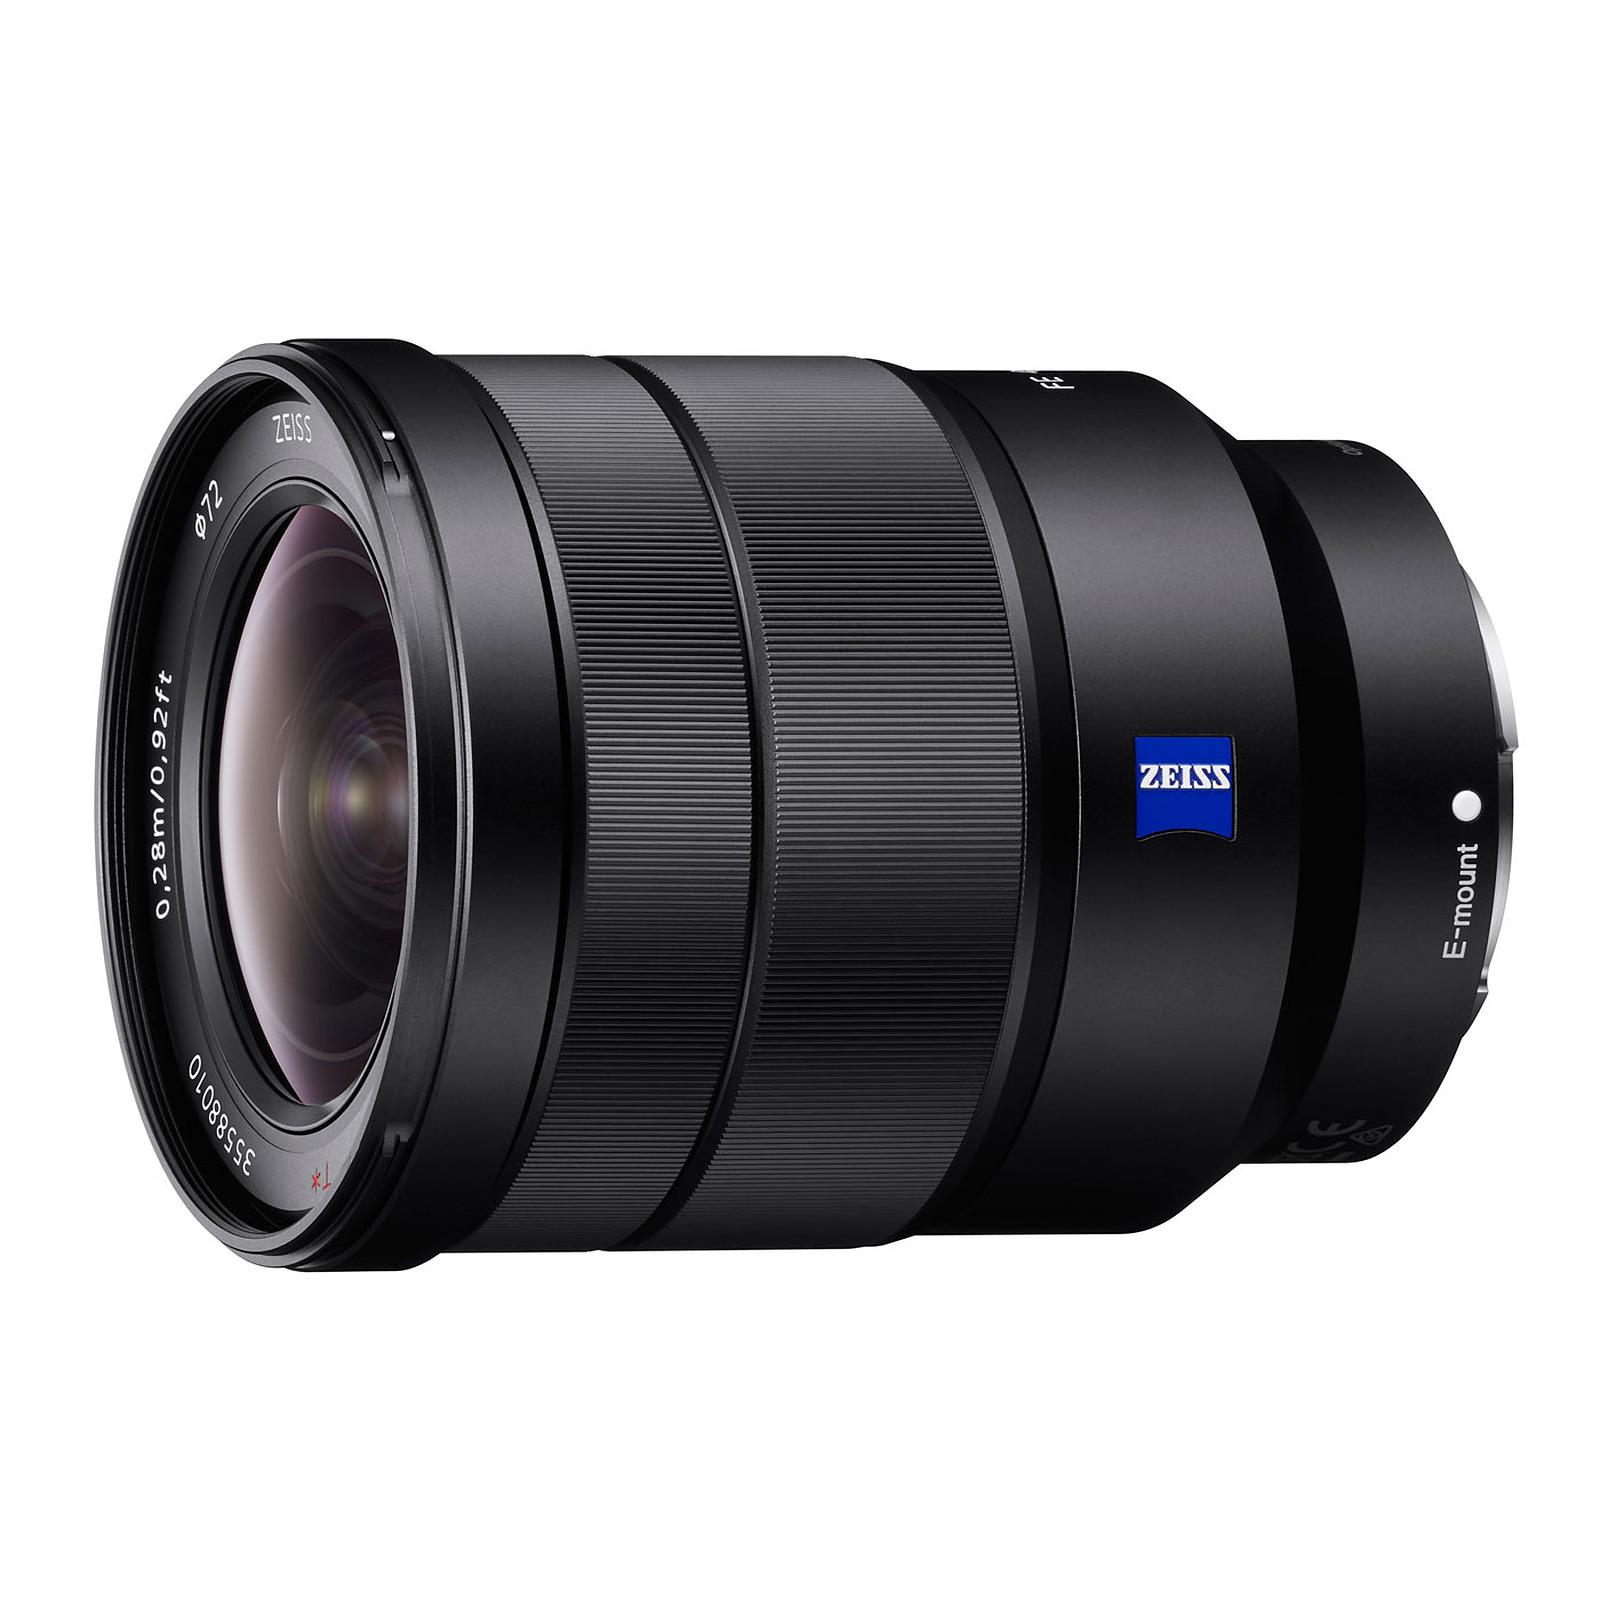 Sony Vario-Tessar FE 16-35mm